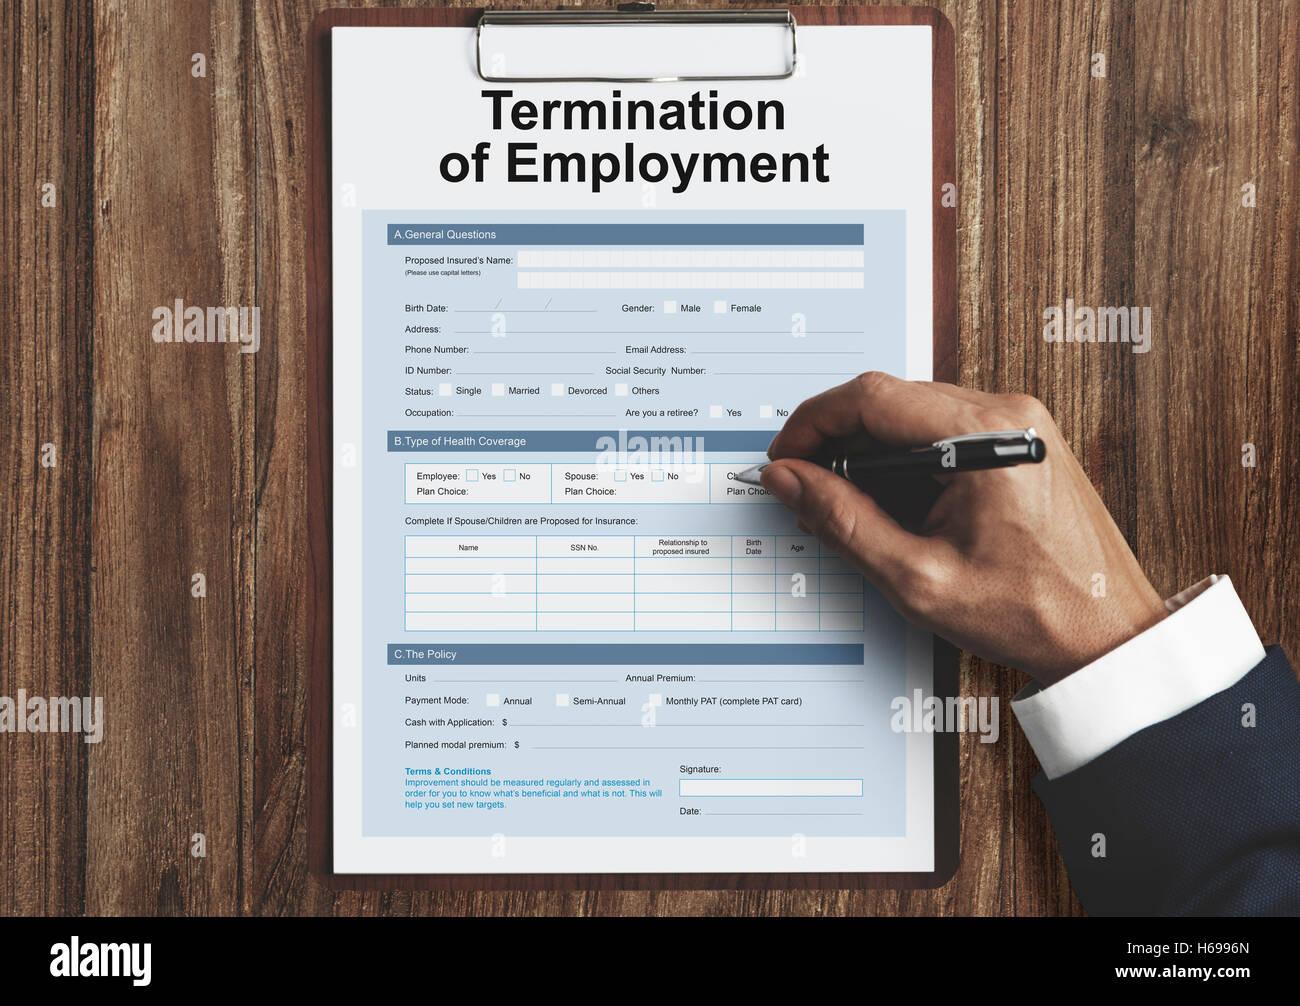 Termination Employment Job Form Concept Stock Photo Alamy